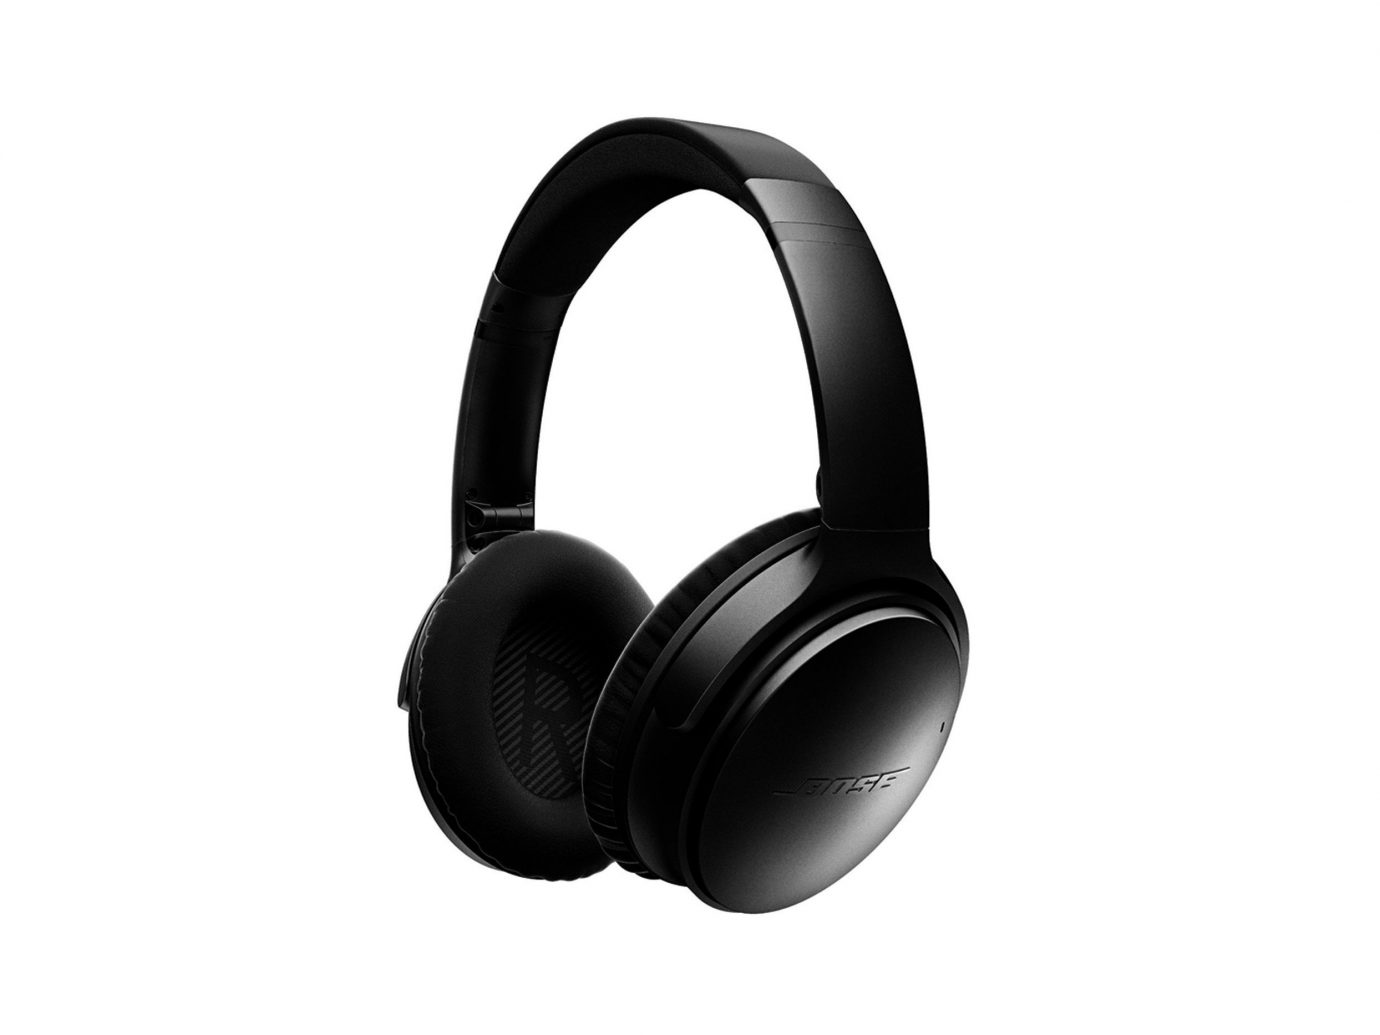 Style + Design electronics earphone headphones gadget technology electronic device audio equipment headset ear communication device audio